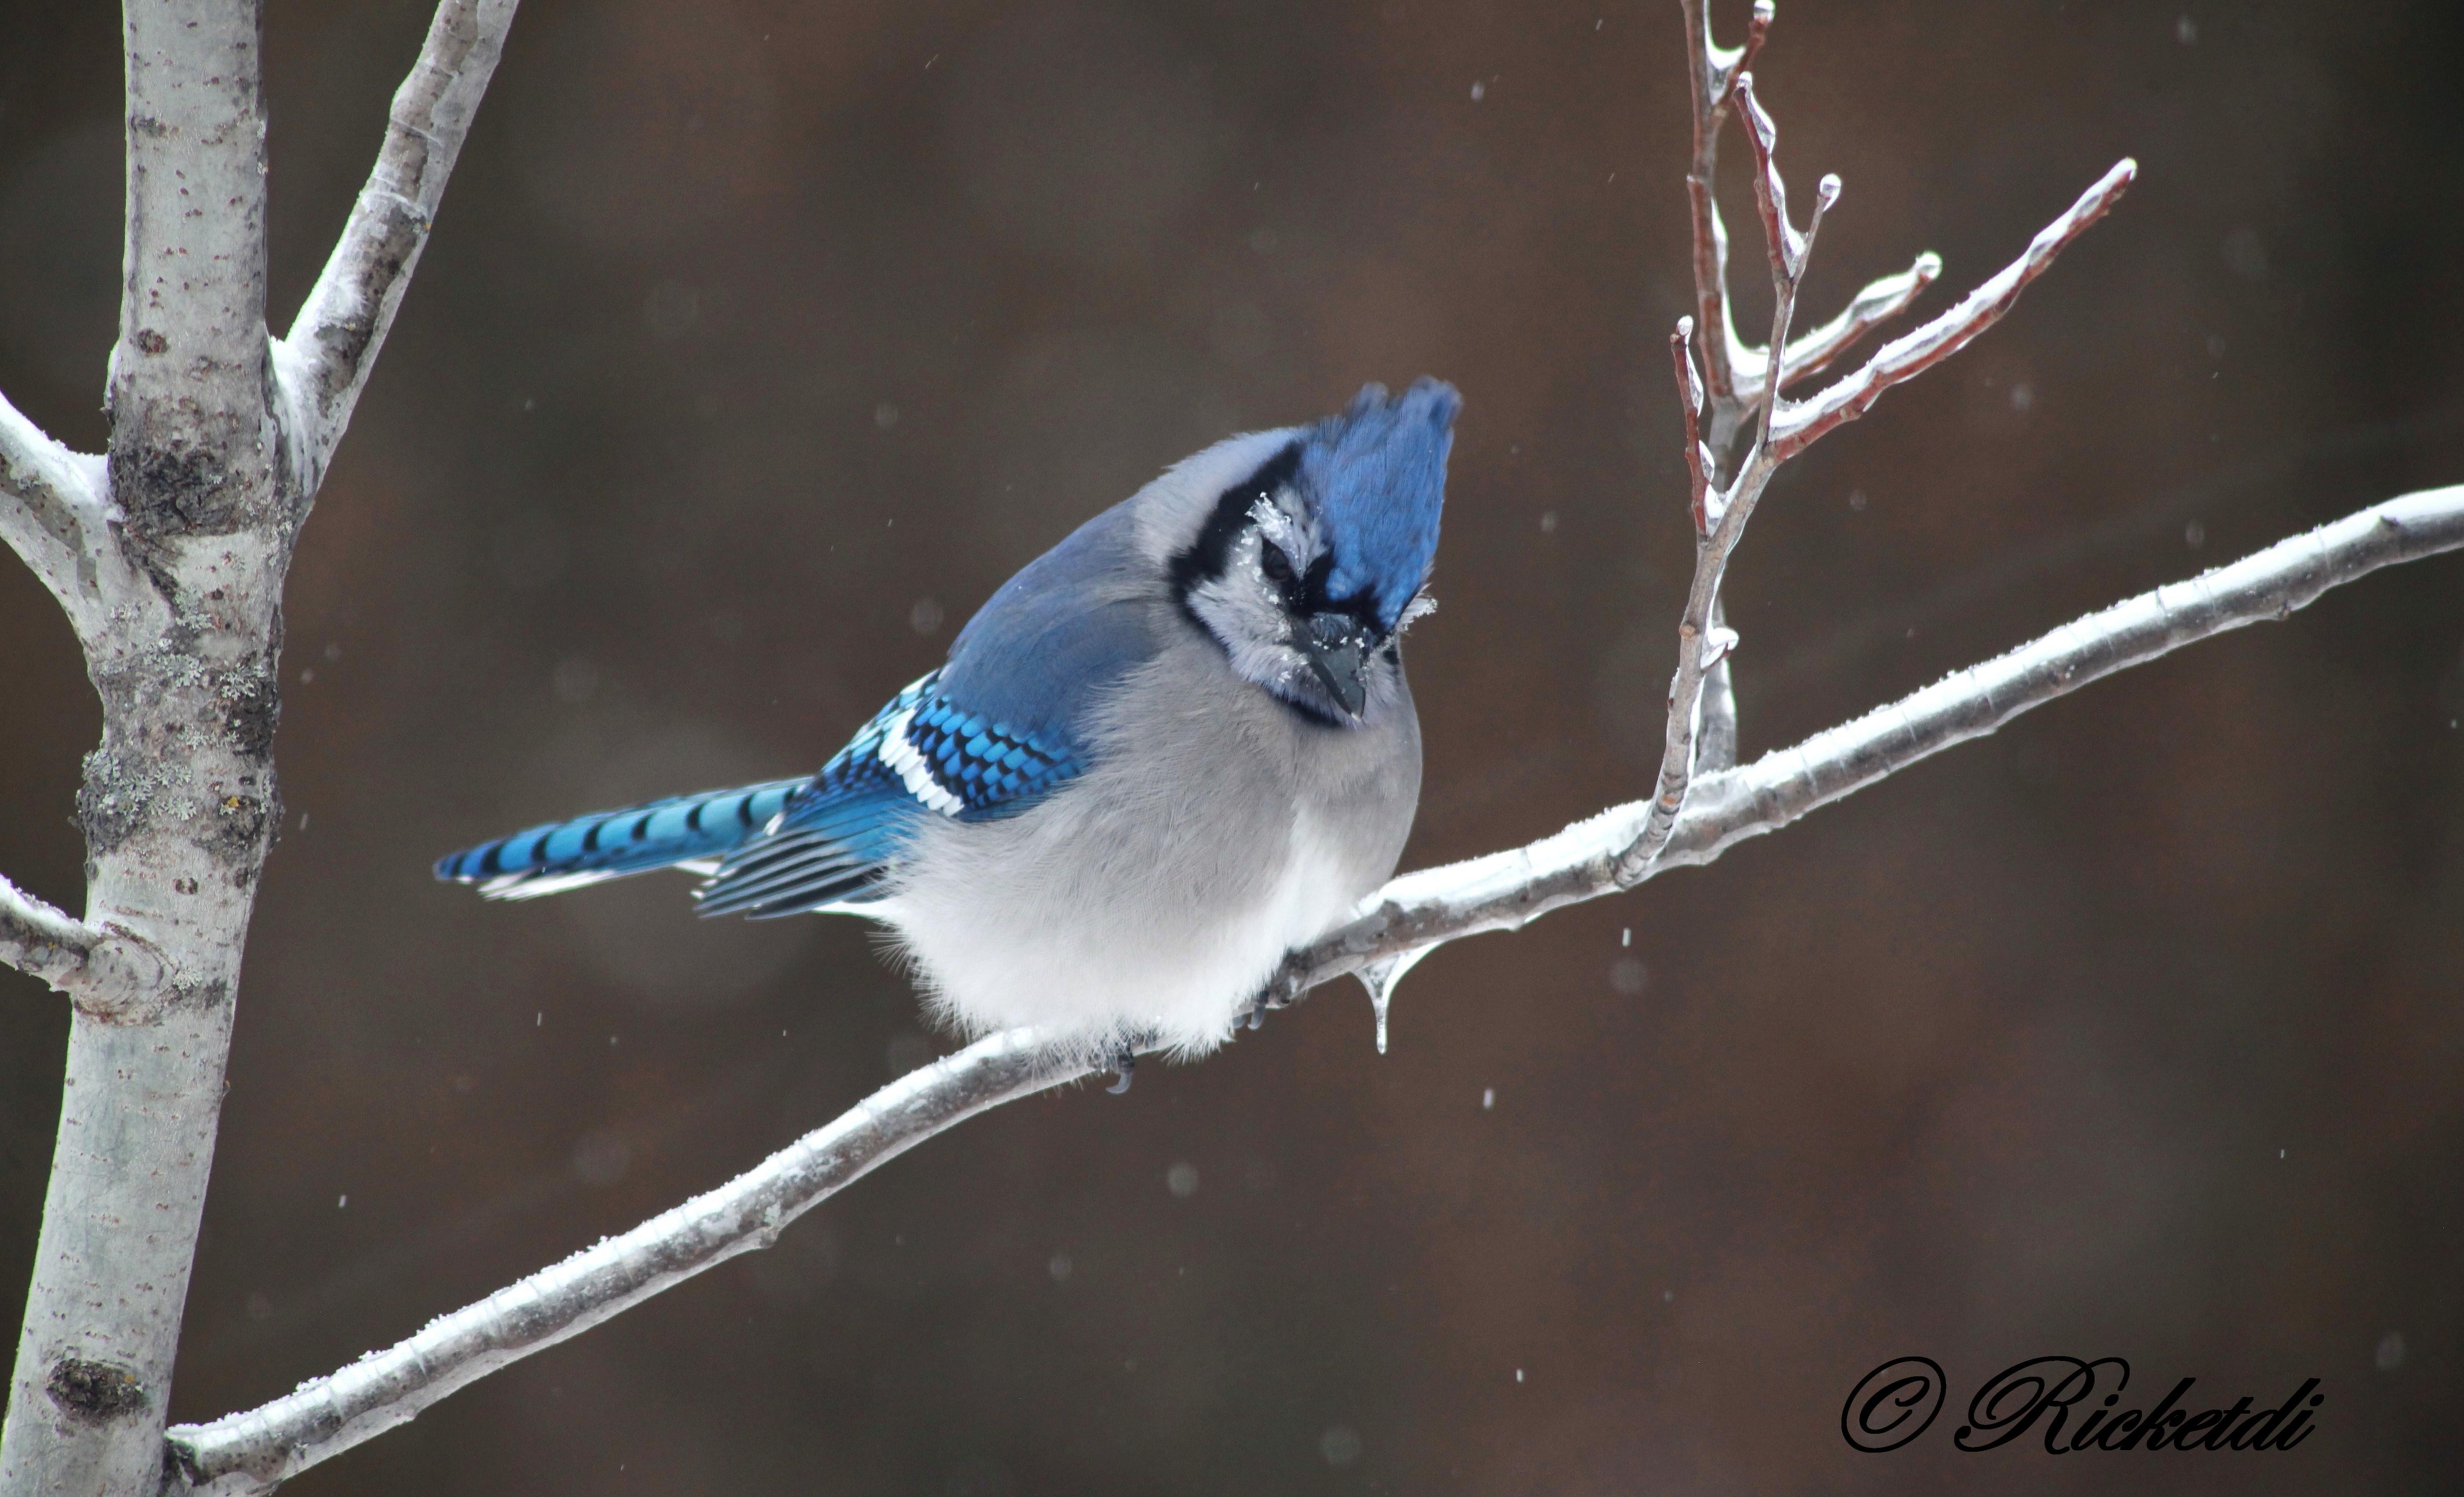 Bird Of Paradise Wallpaper Iphone 5 Blue Jay 5k Retina Ultra Hd Wallpaper And Background Image